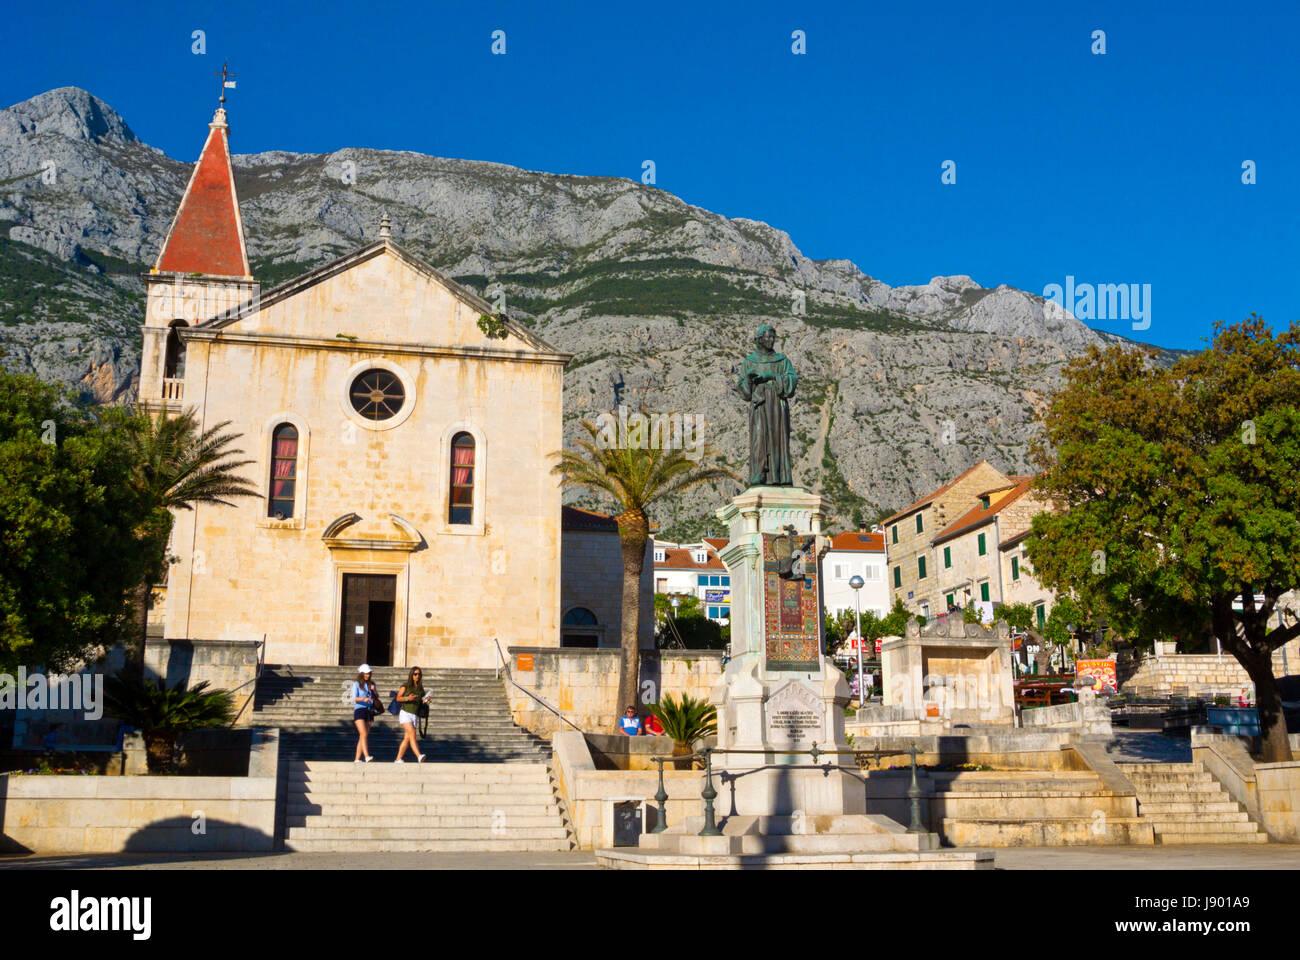 Kačićev trg, main square, Makarska, Dalmatia, Croatia - Stock Image